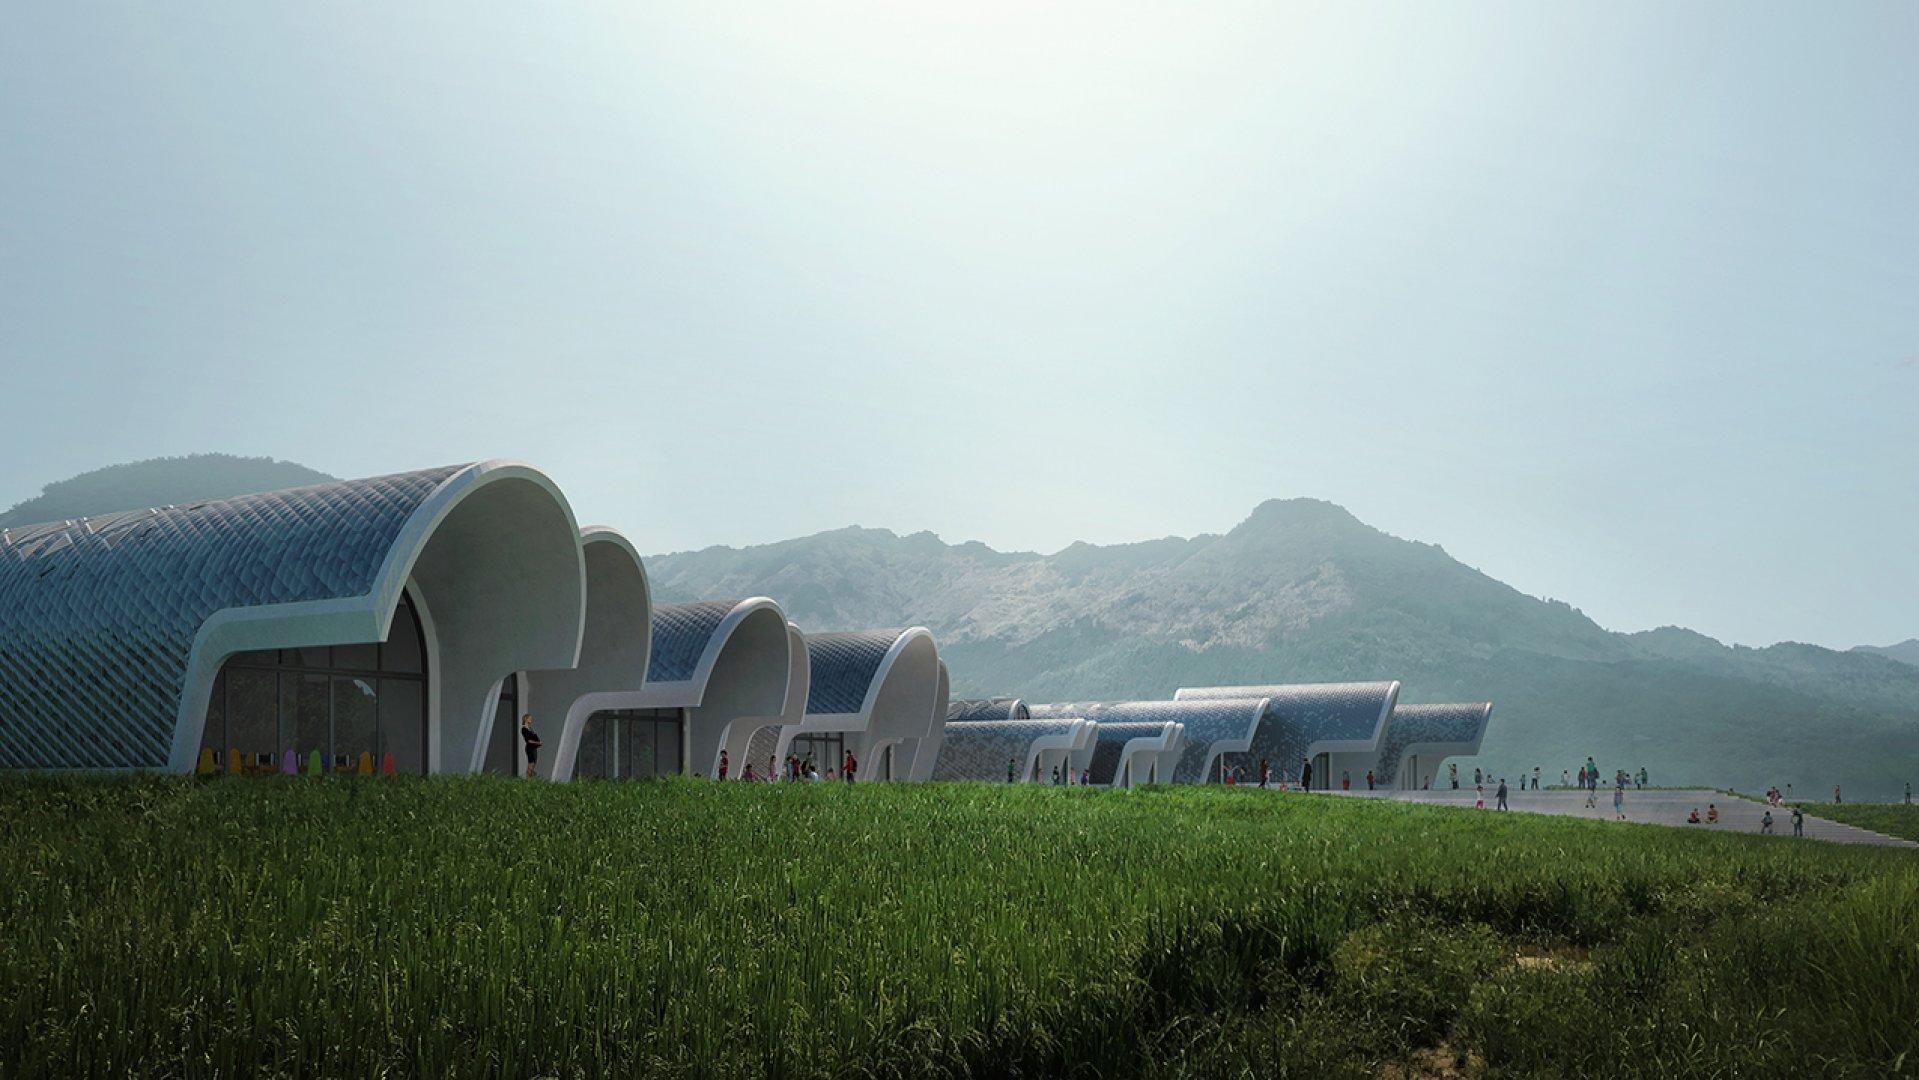 Zaha Hadid Architects // Rendered by ZHA